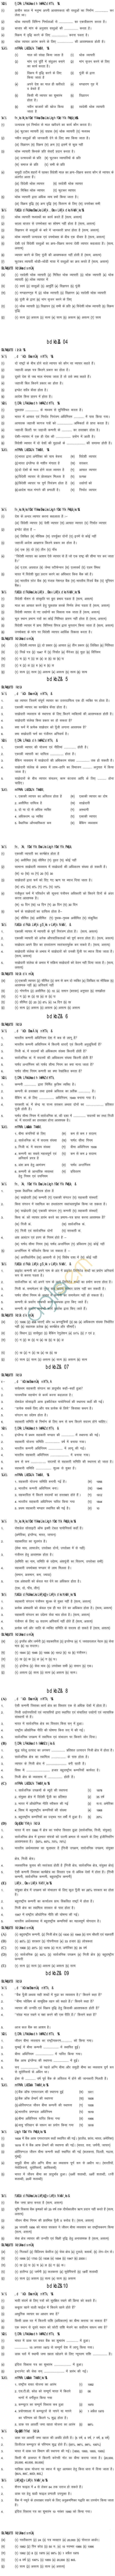 Chhattisgarh Board Class 11 Question Bank - Vanijya & Prabandh Ke multatva